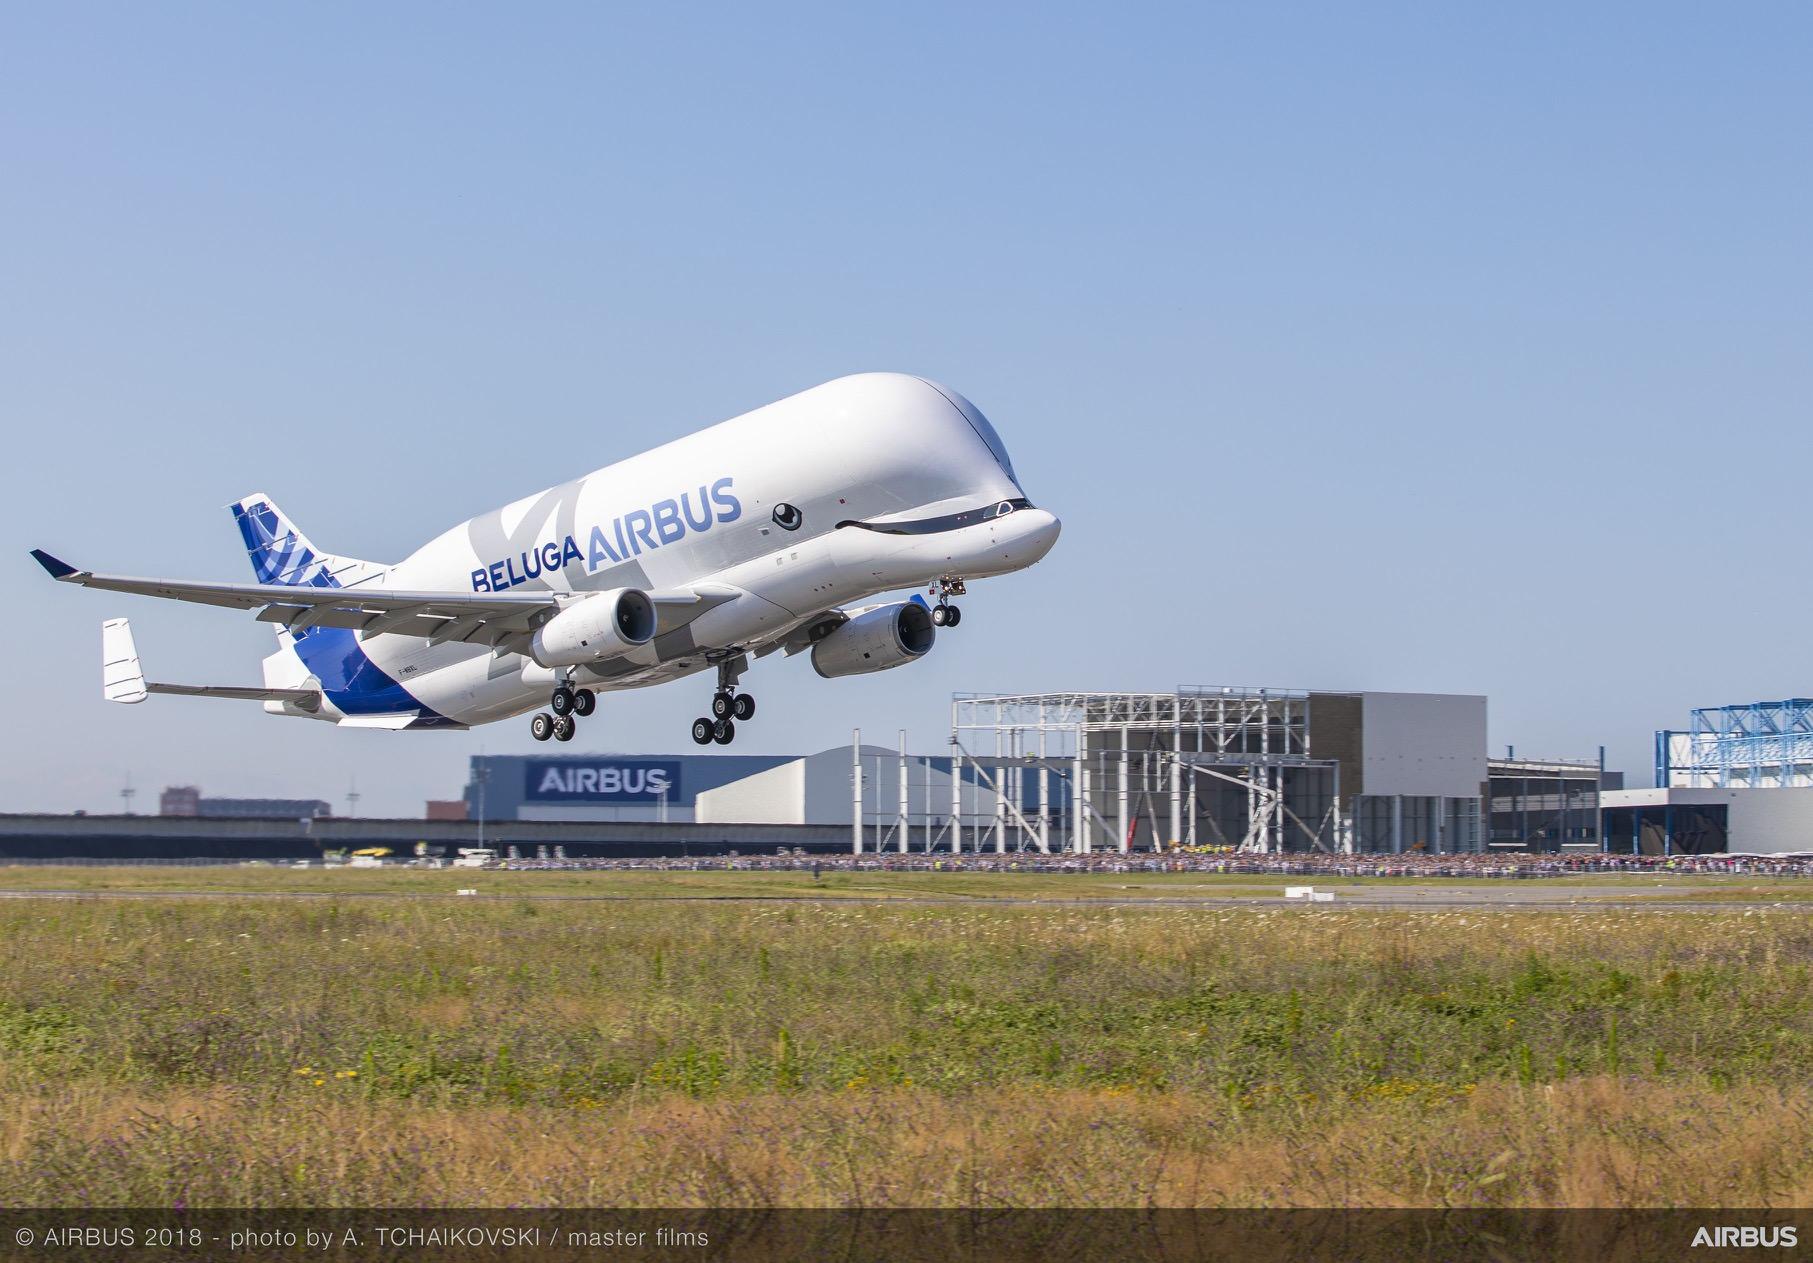 BelugaXL-First-Flight-take-off